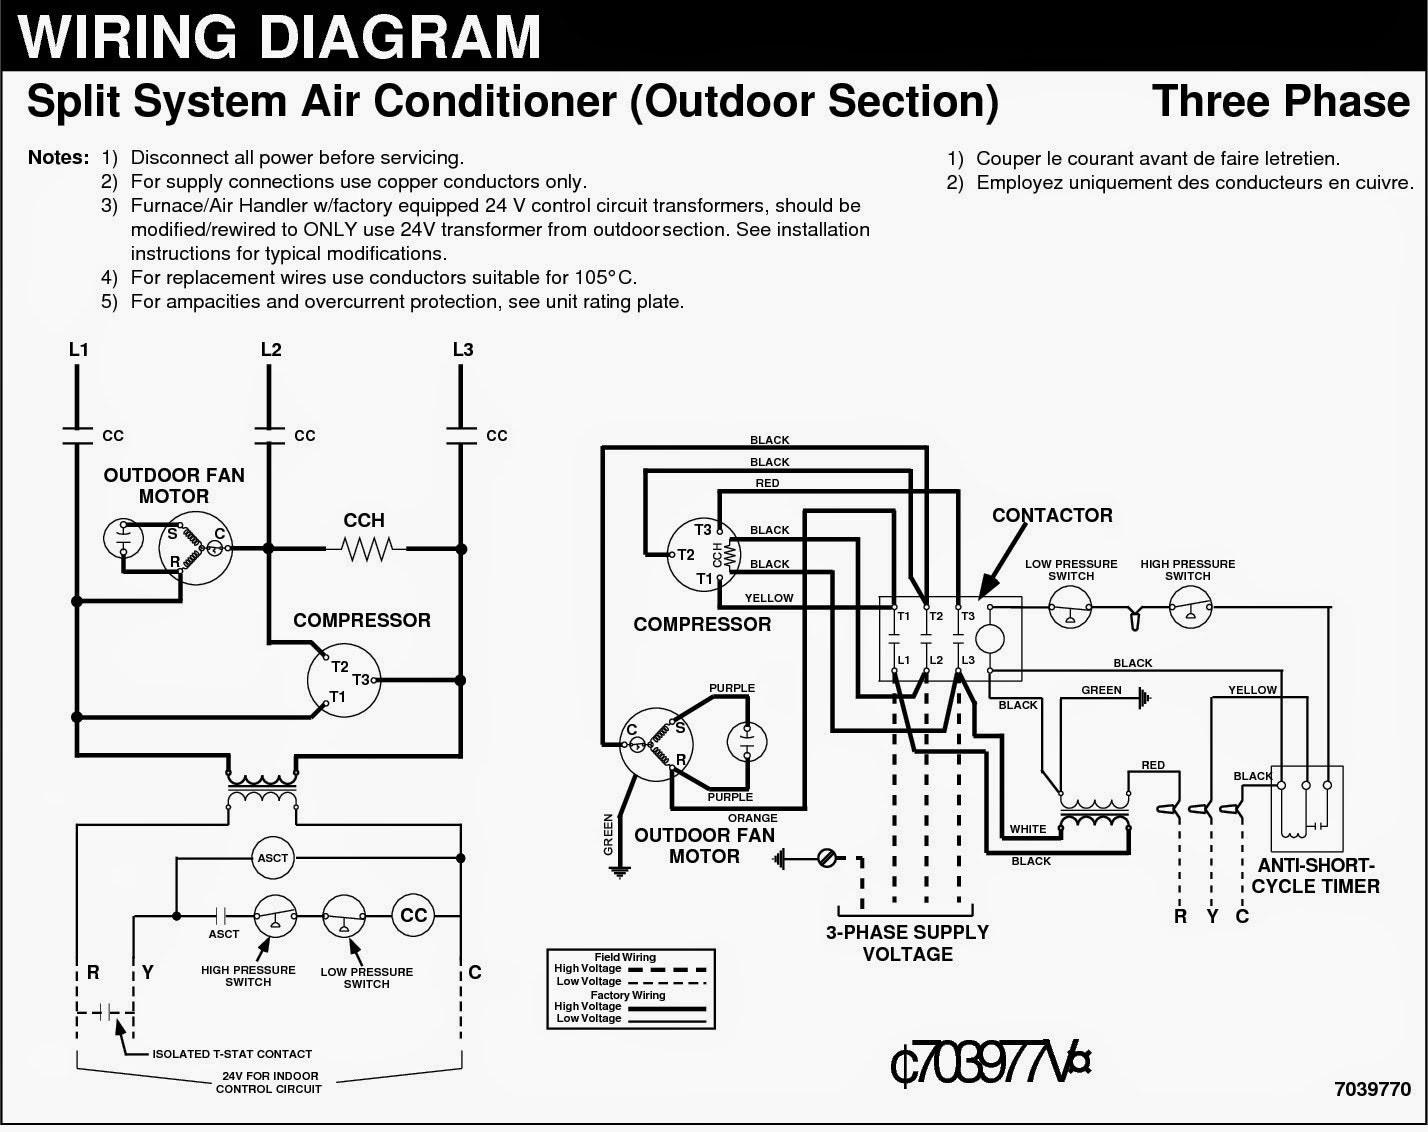 Induction Motor Wiring Diagrams